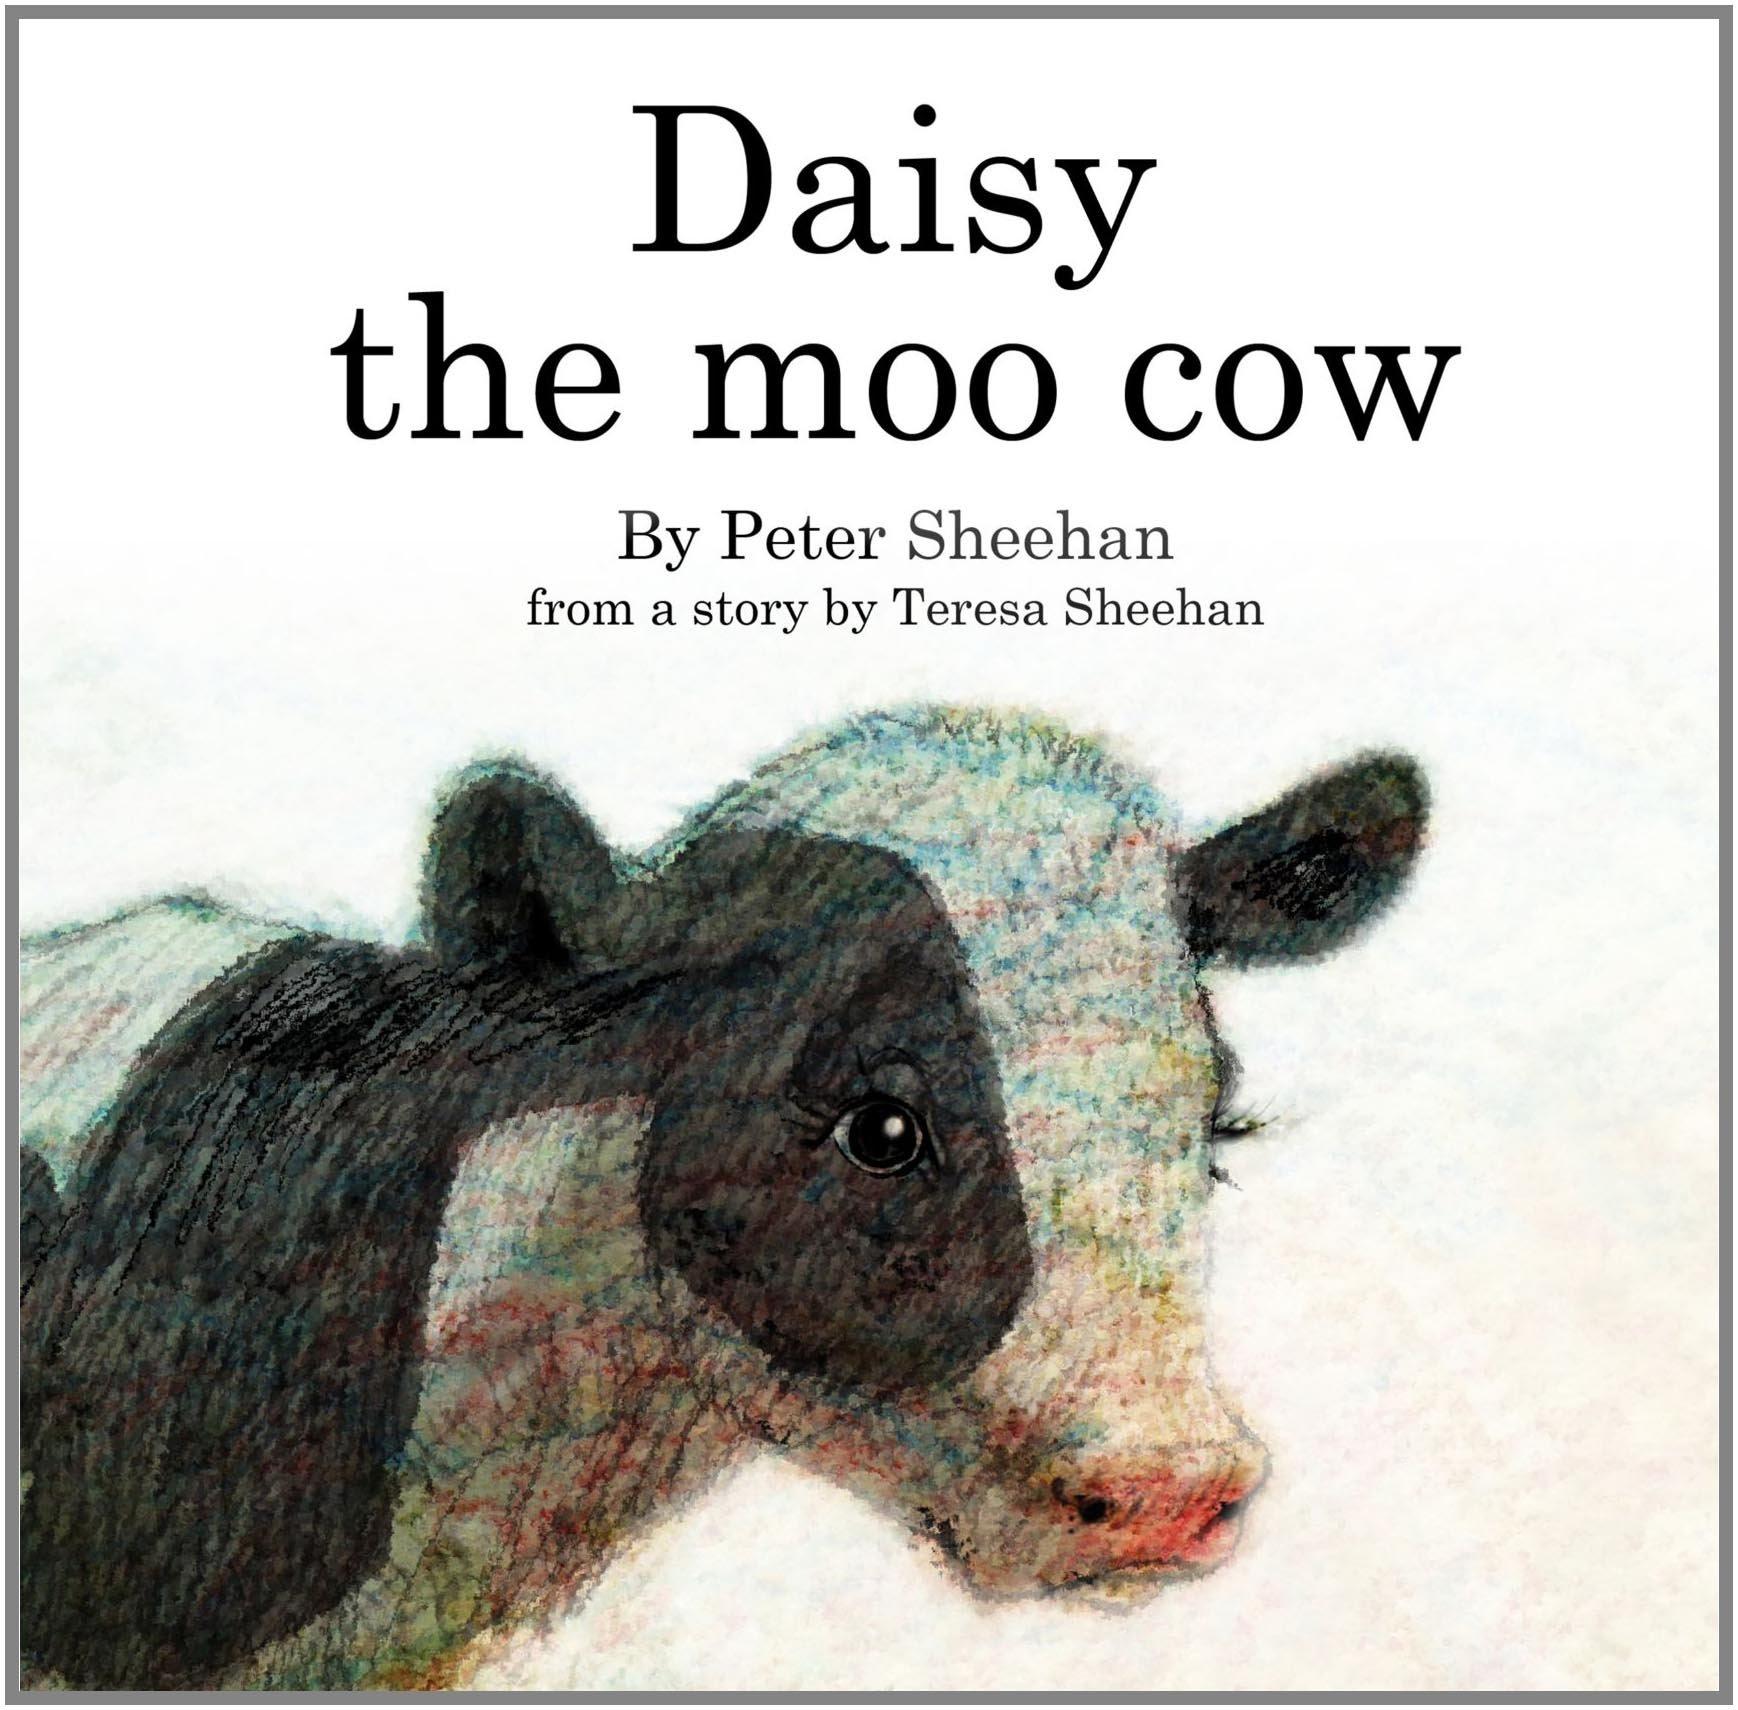 daisy the moo cow peter sheehan books